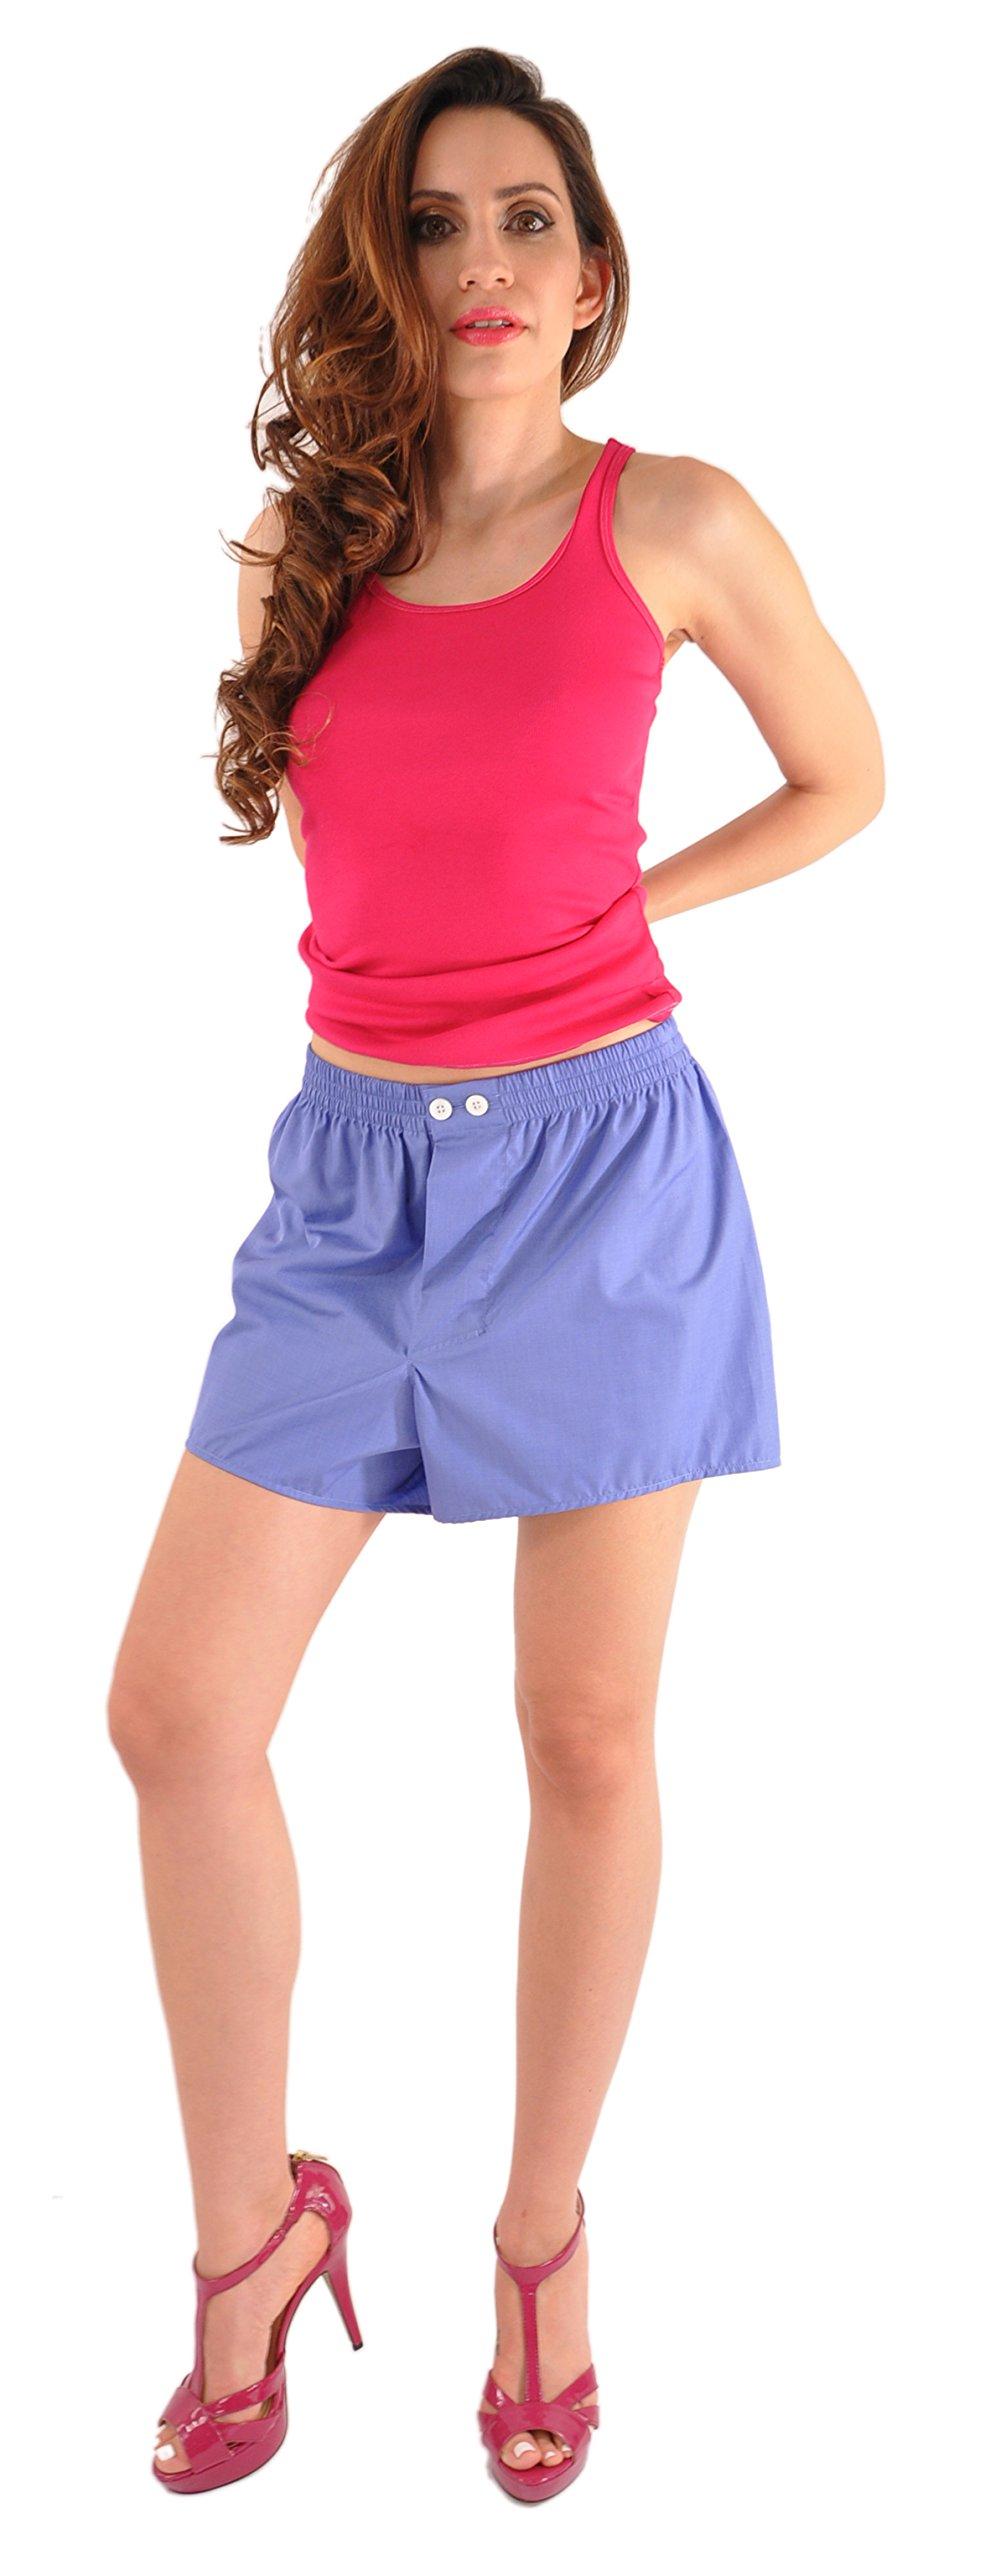 World's Finest Woven Boxer Shorts - 3 Pairs Medium/Blue by Kabbaz-Kelly (Image #4)